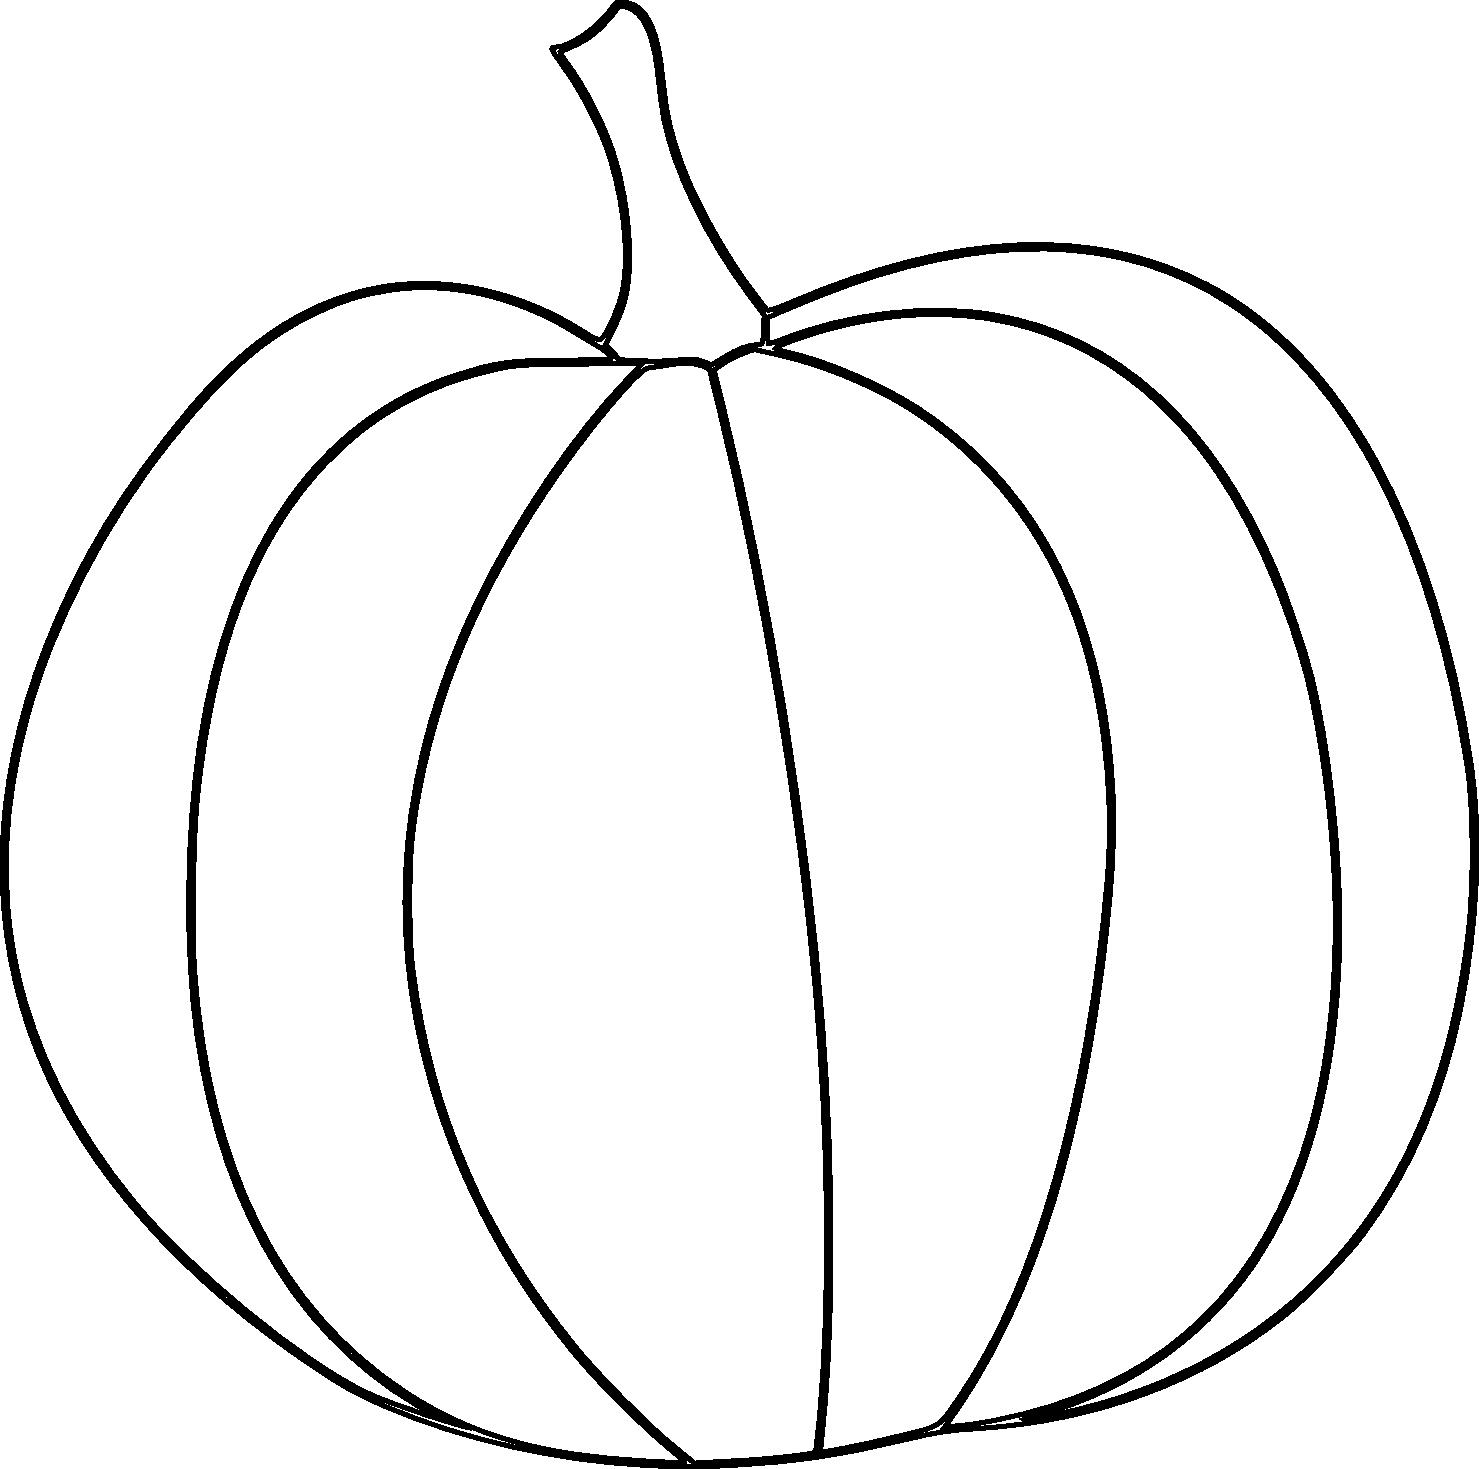 Line Art Templates : Pumpkin outline coloring home